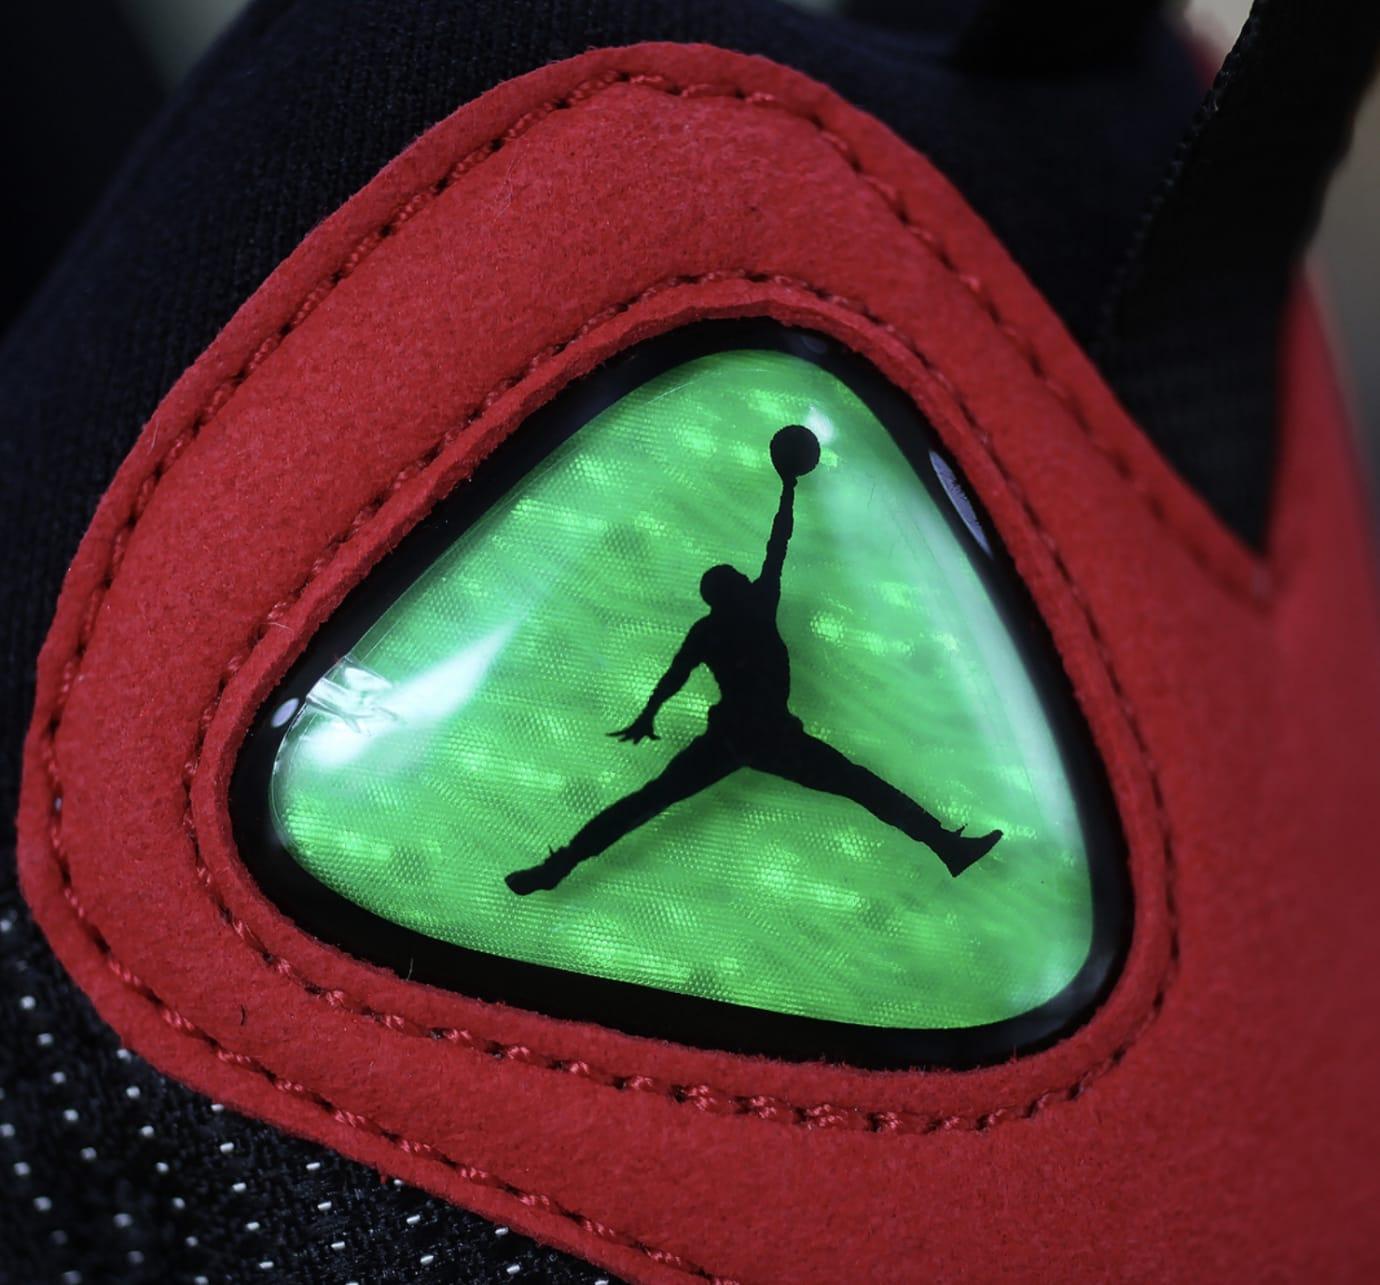 Tinker Air Jordan 13 'Bred' (Hologram)